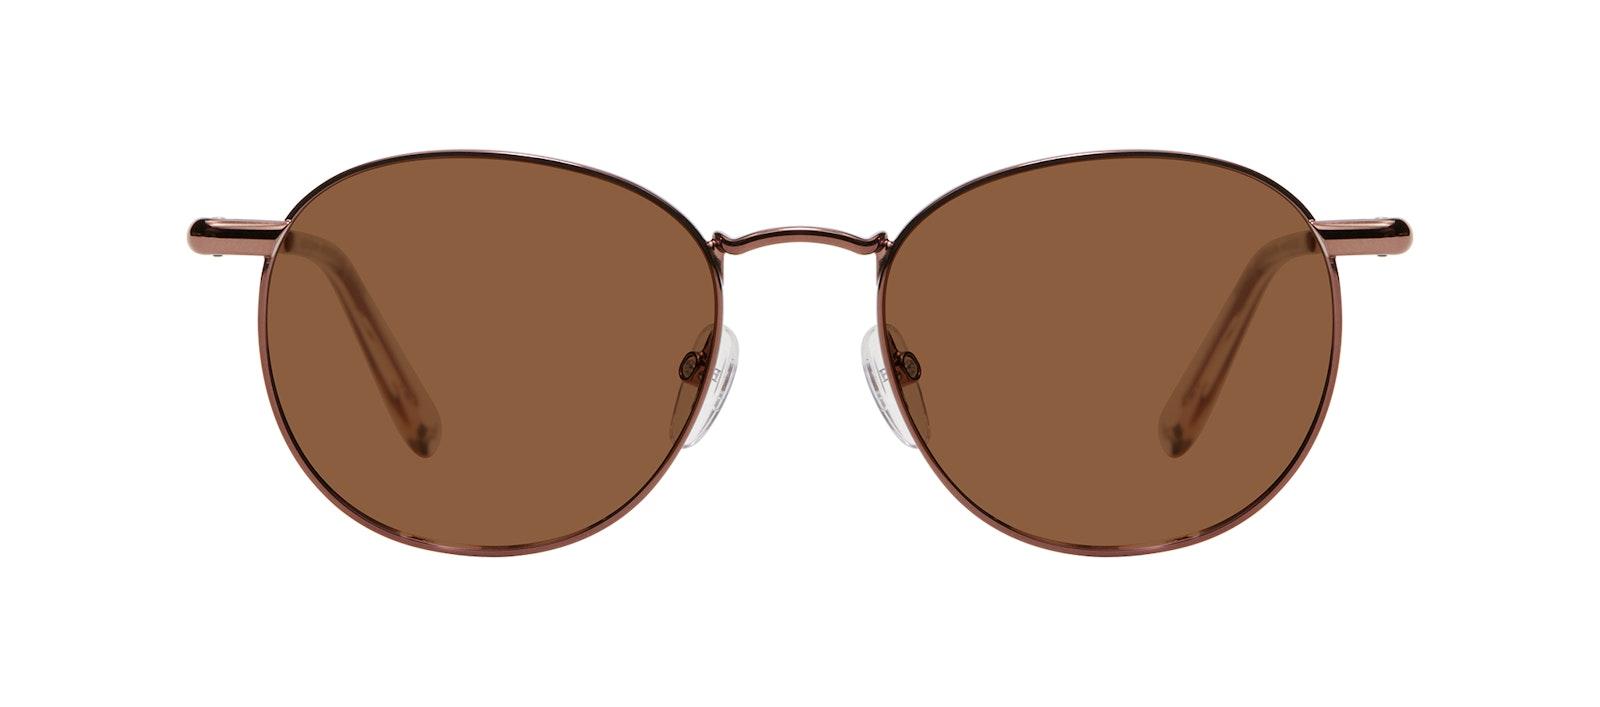 Affordable Fashion Glasses Round Sunglasses Men Women Divine M Copper Front